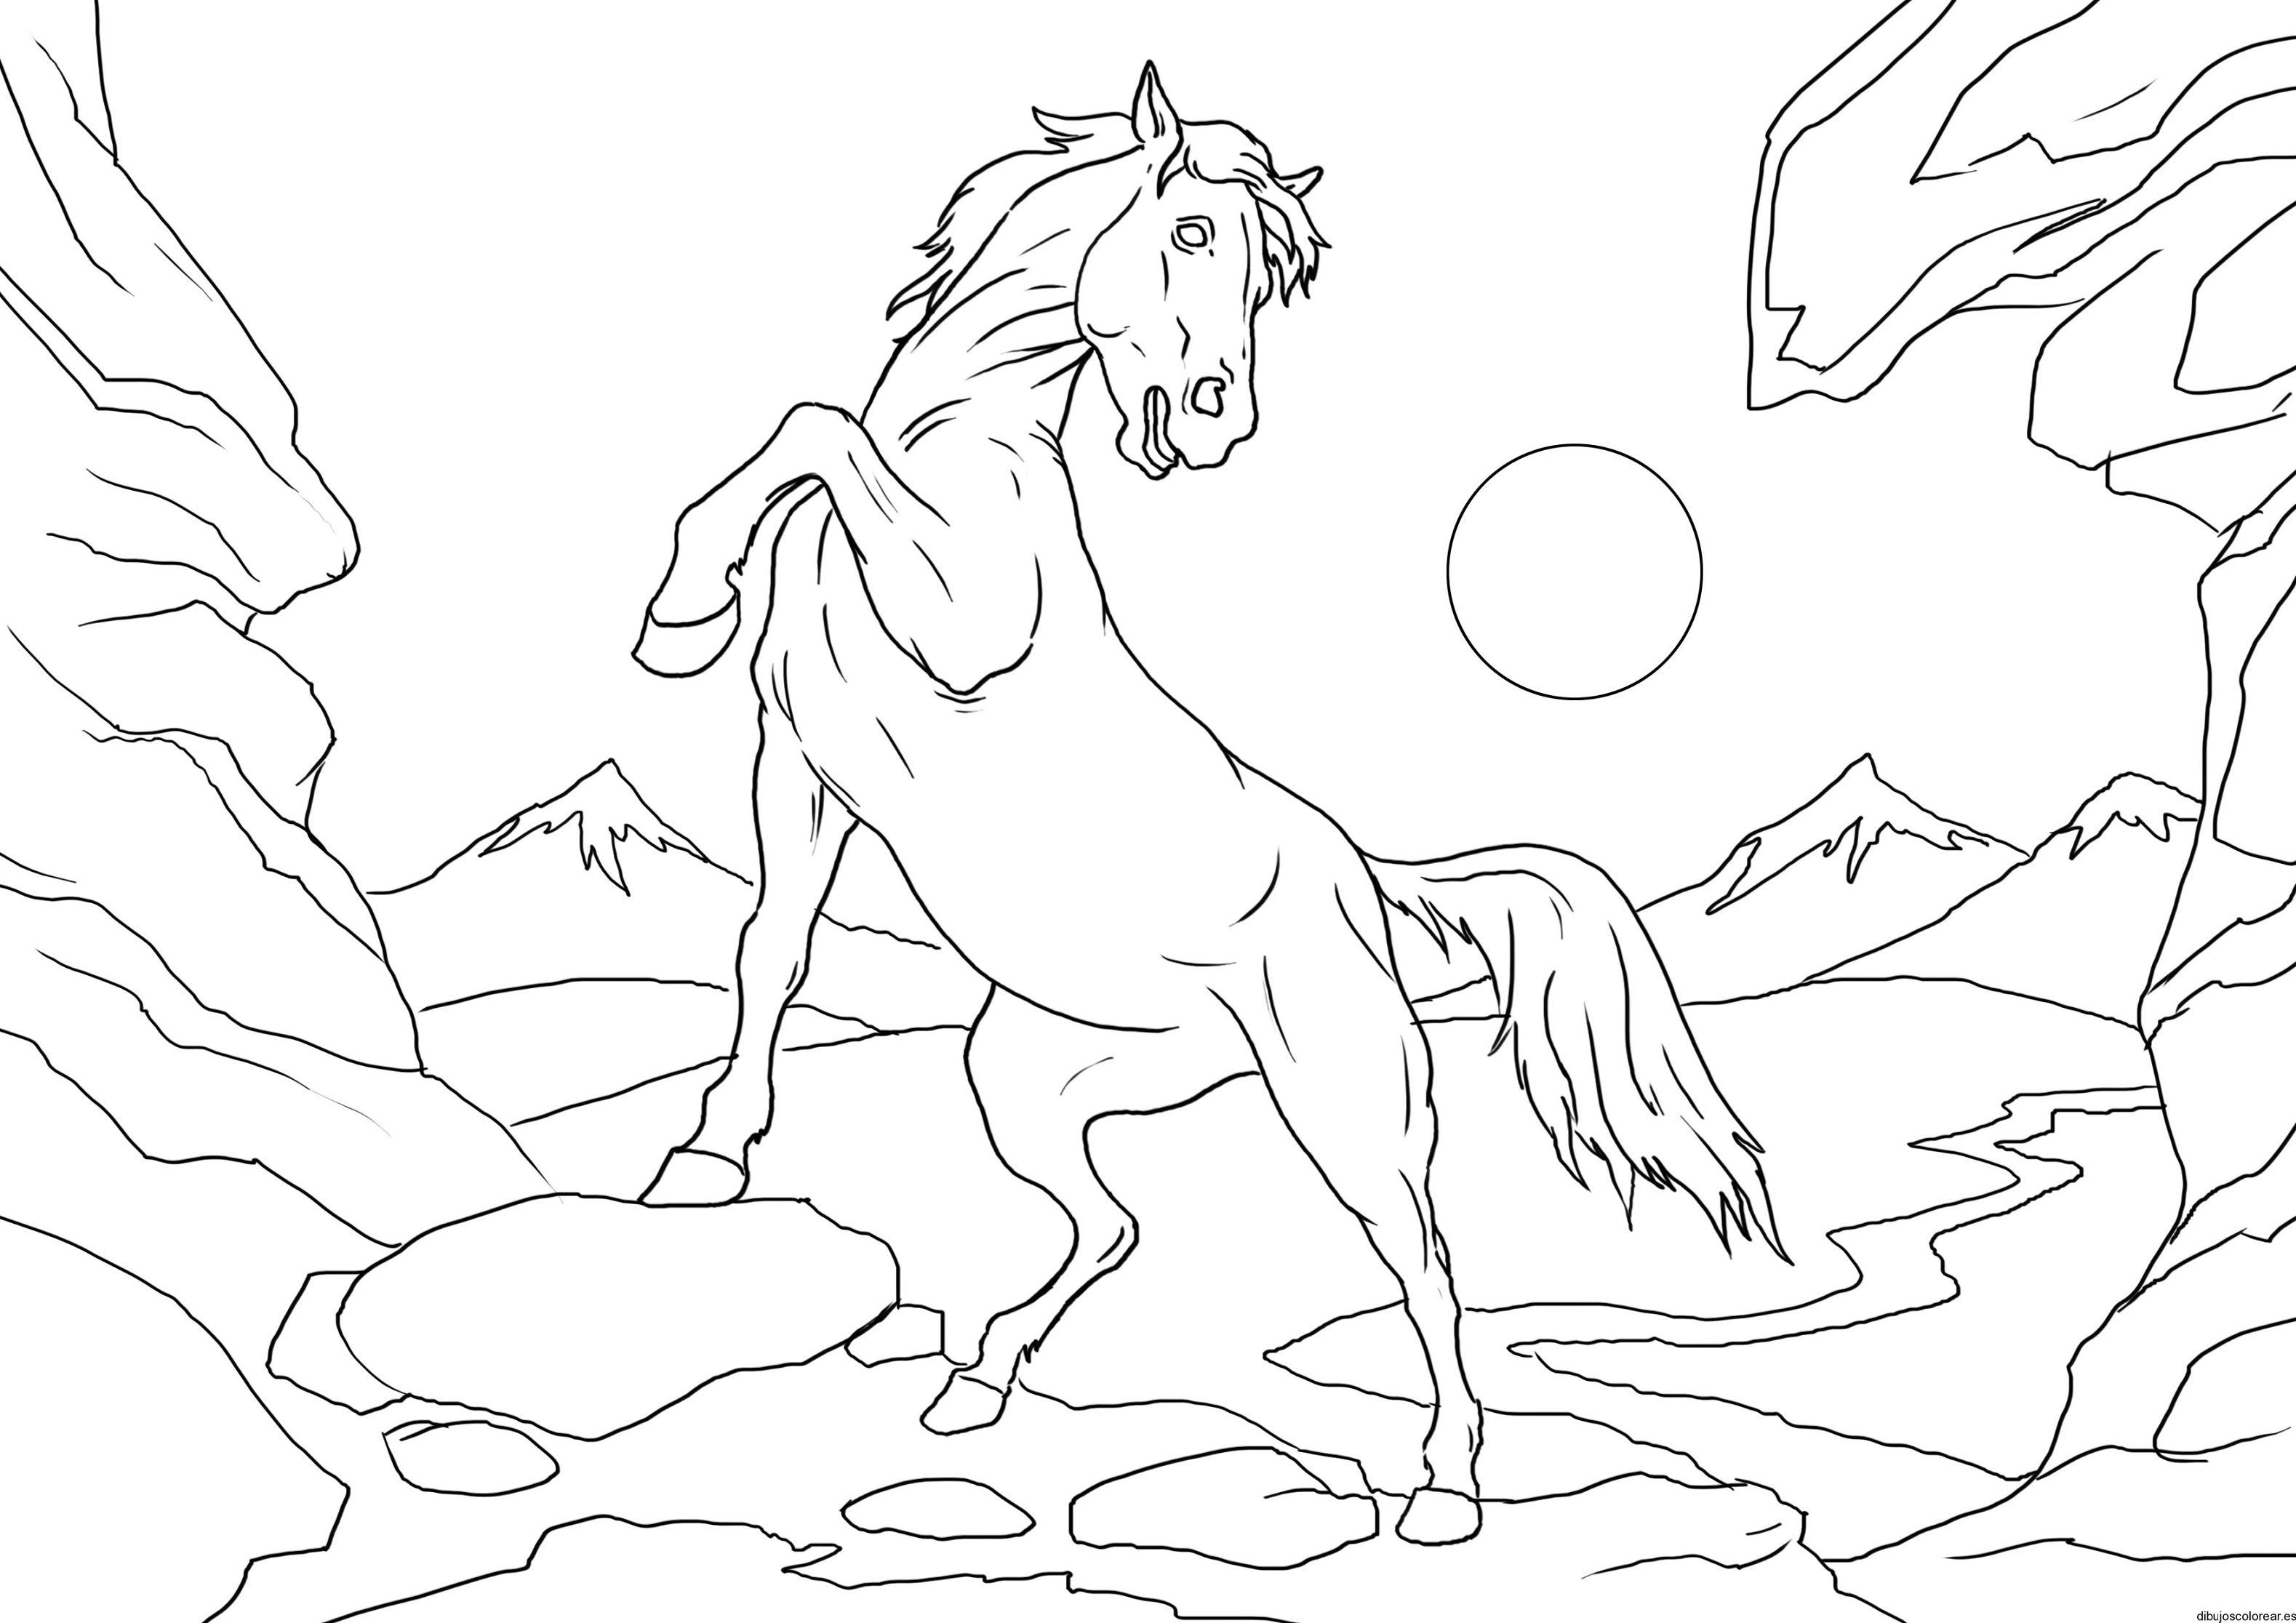 Worksheet. Imagenes de caballos para colorear y dibujar  Imagenes para dibujar